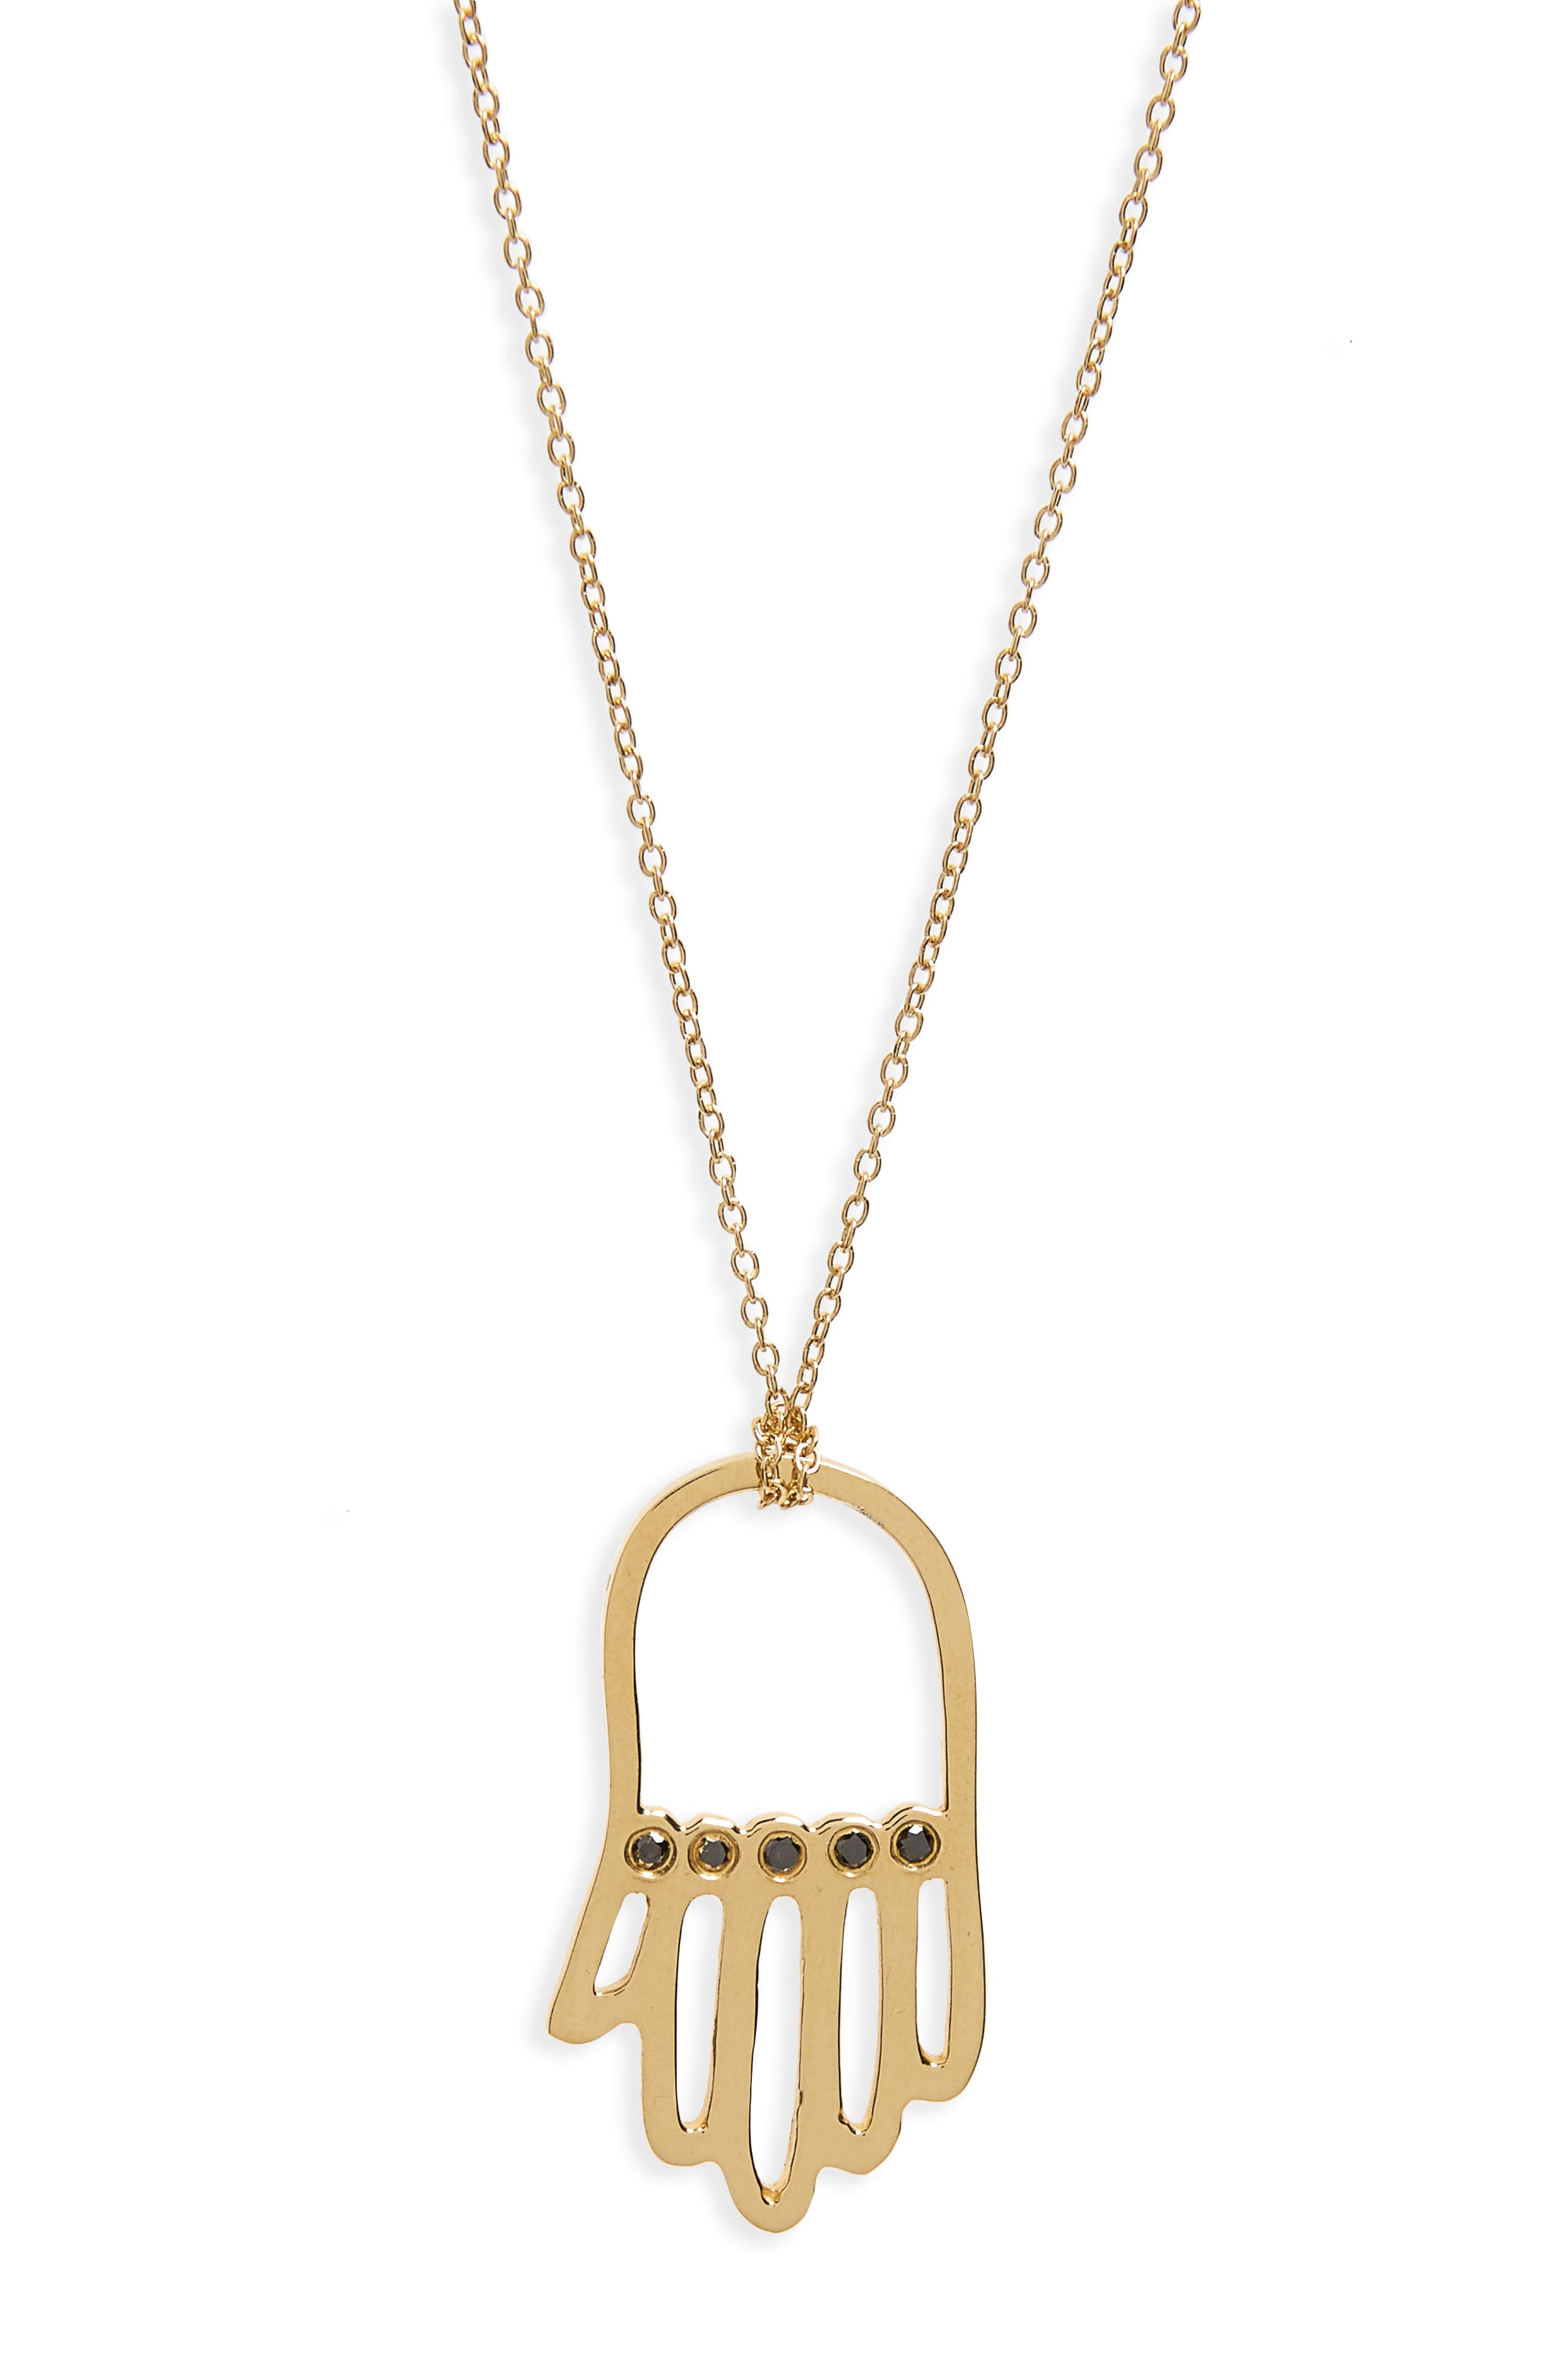 x Rashida Jones Black Diamond Hamsa Pendant Necklace,                             Main thumbnail 1, color,                             YELLOW GOLD